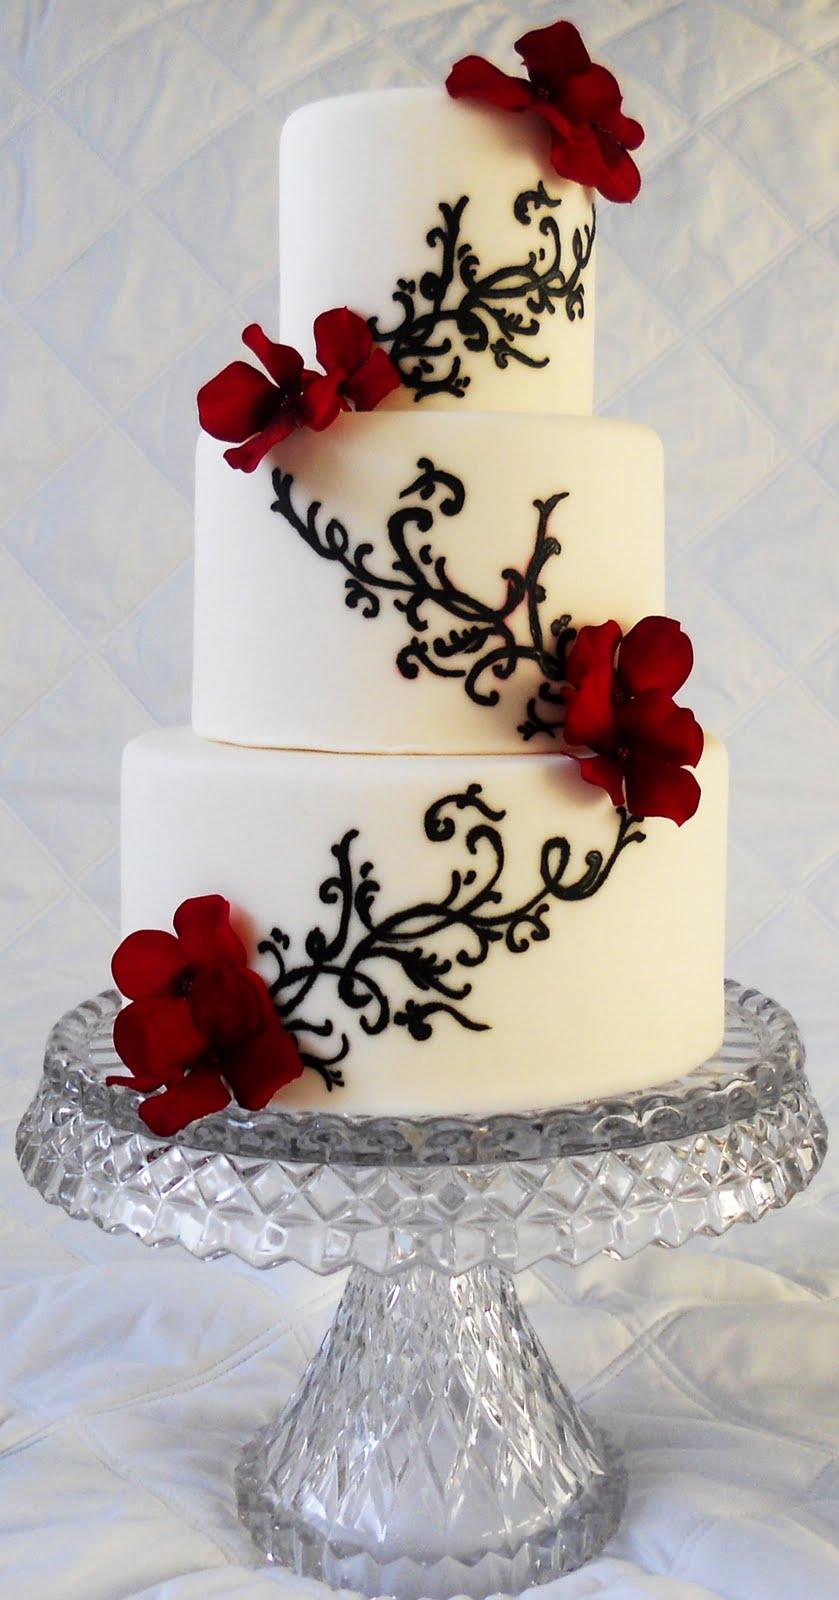 Pin Ivory Black Wedding Cake By Katies Cakes Cake on Pinterest